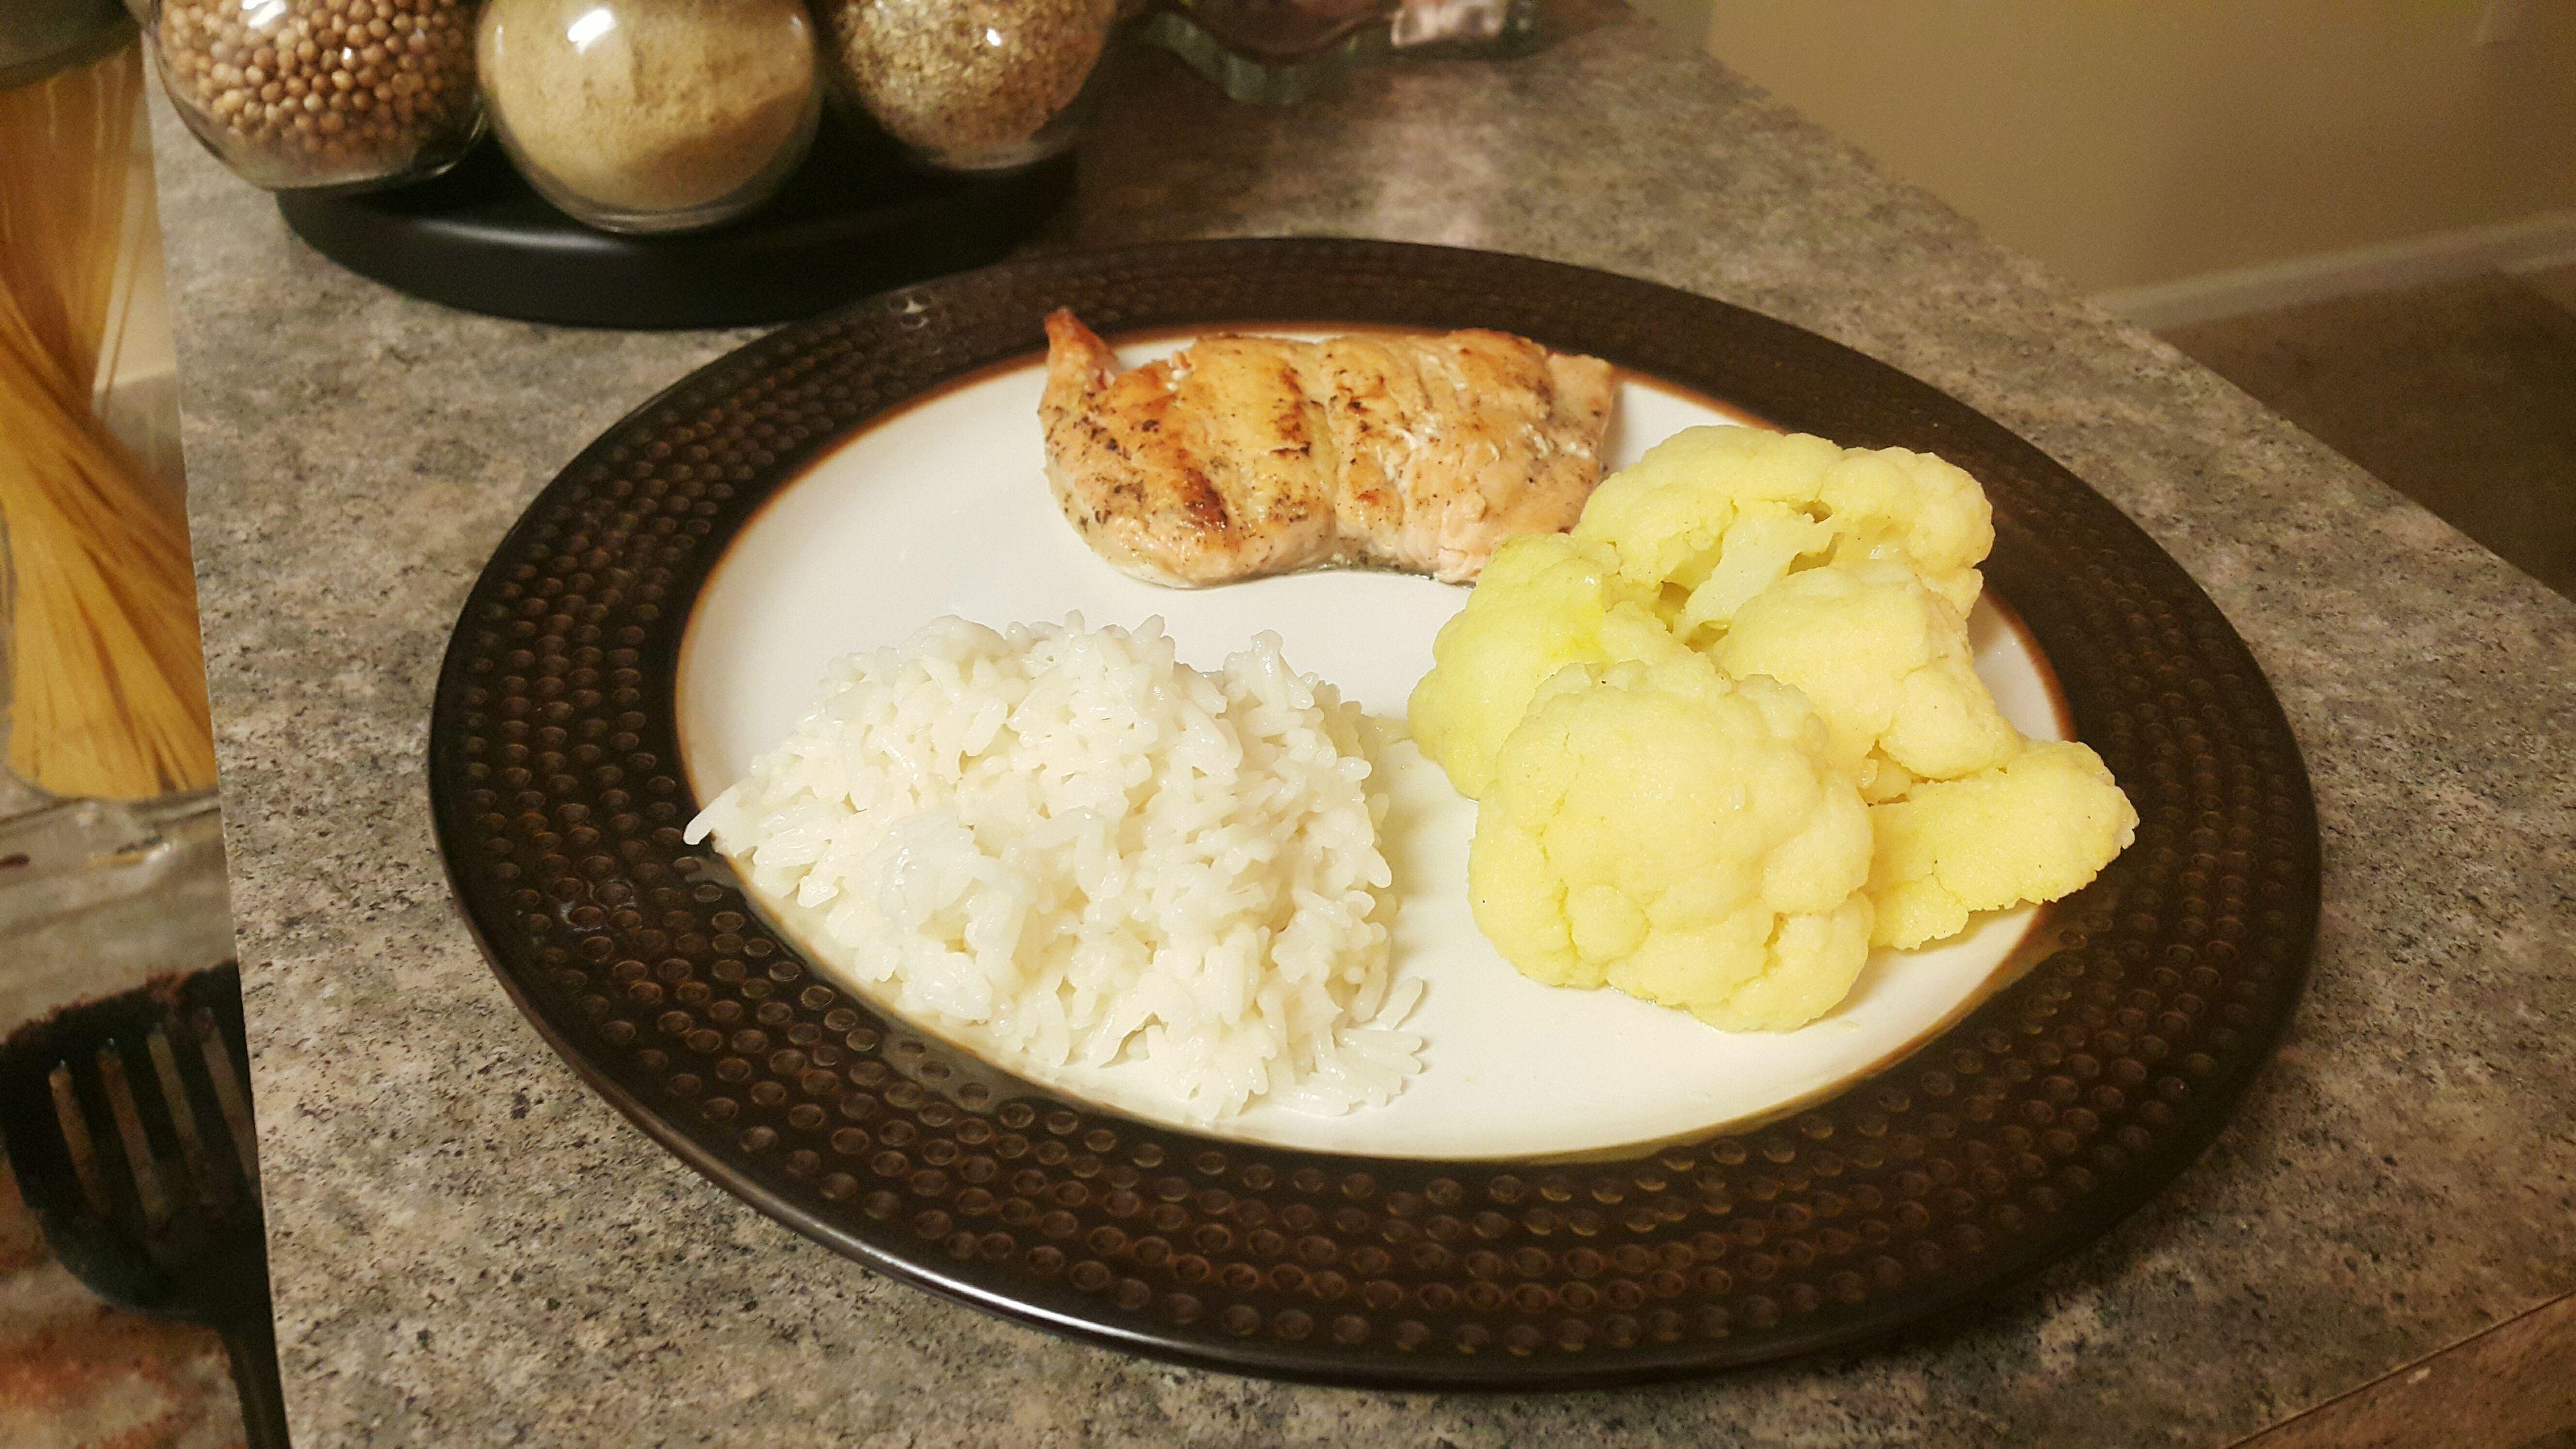 Chefrock Foodporn Dinner Panseared Salmon Fish